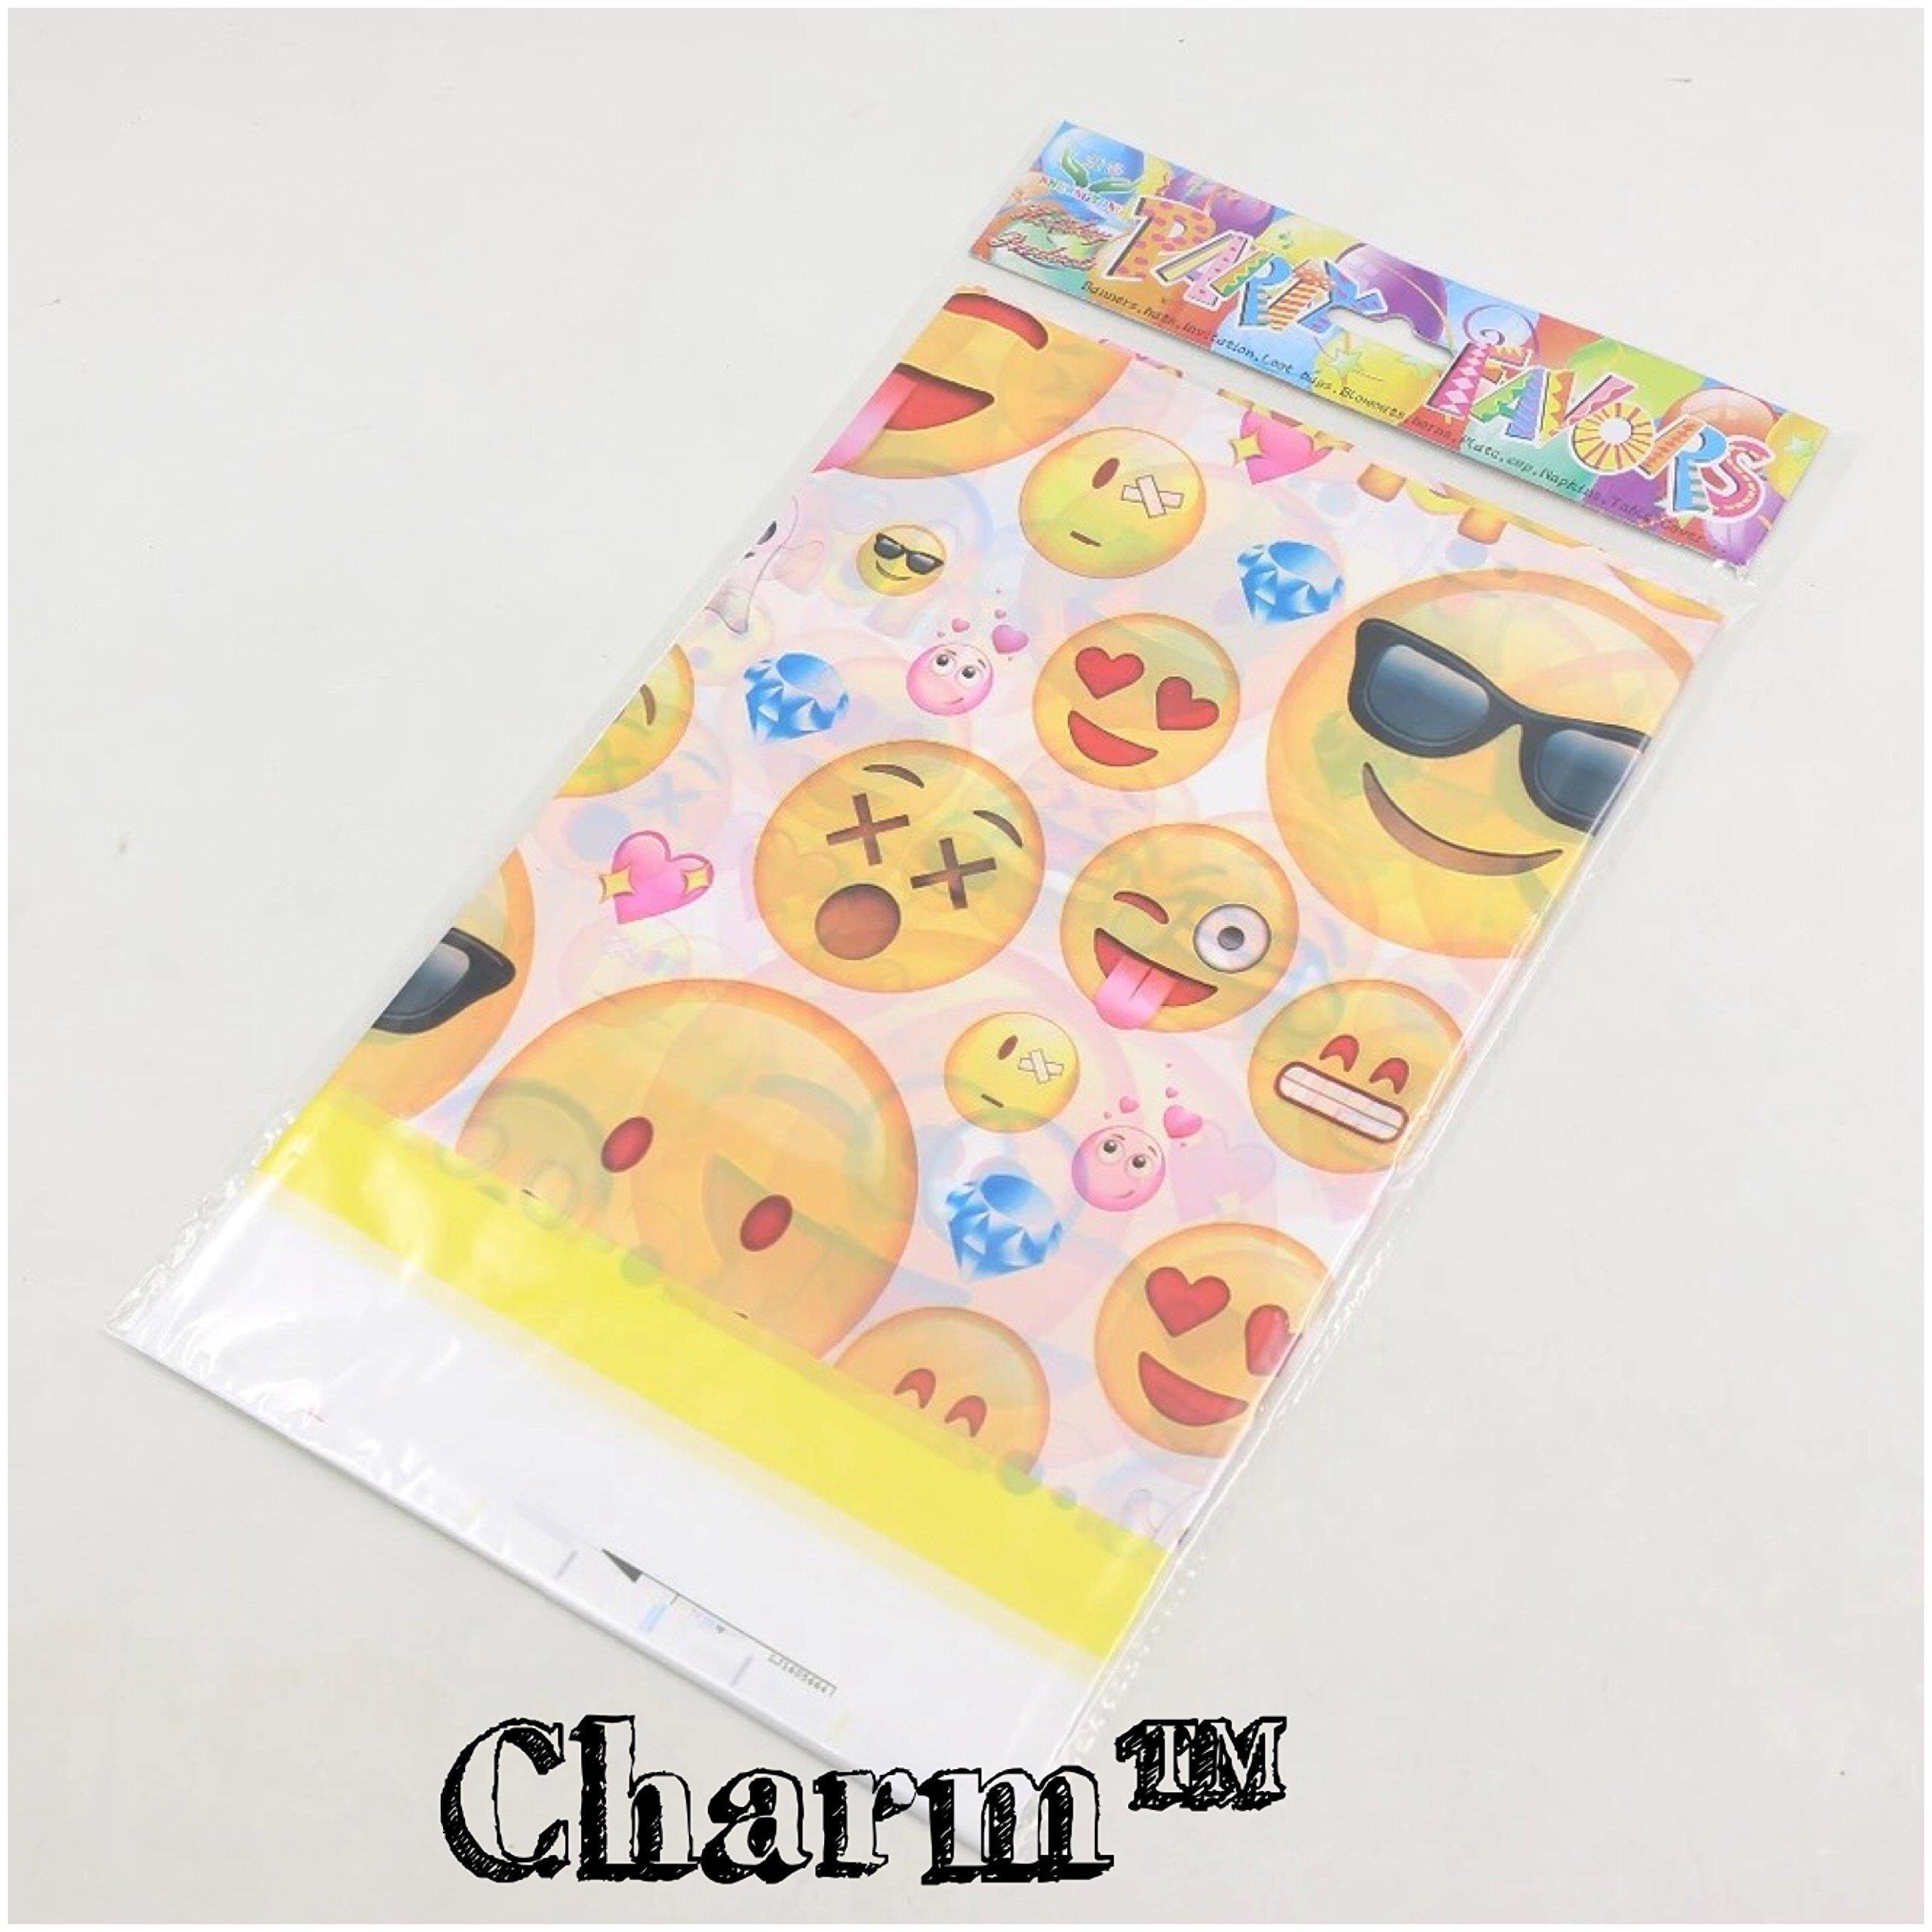 CharmTM Emoji set of 2 Party Tablecloths Plastic 71'' X 42.5'' Emoji Party Essentials by